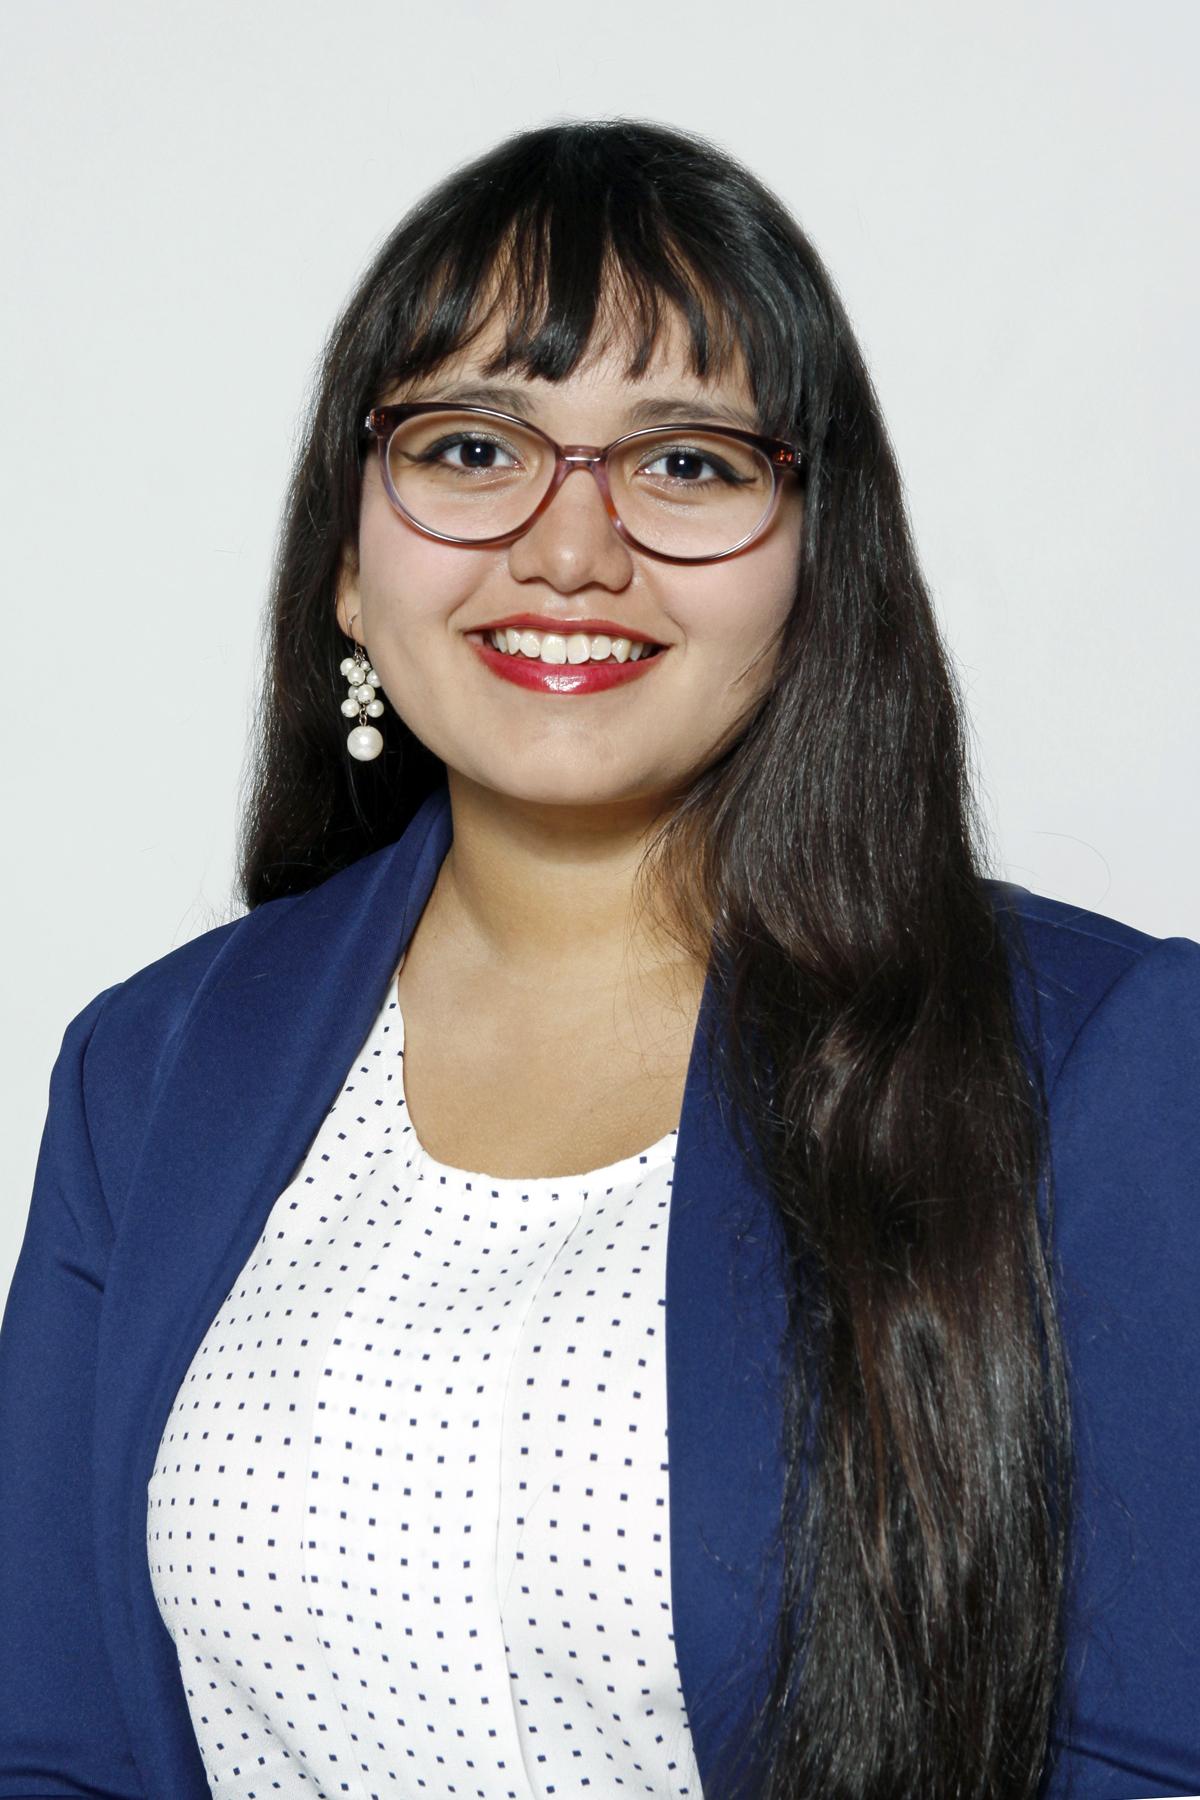 Amy Medina